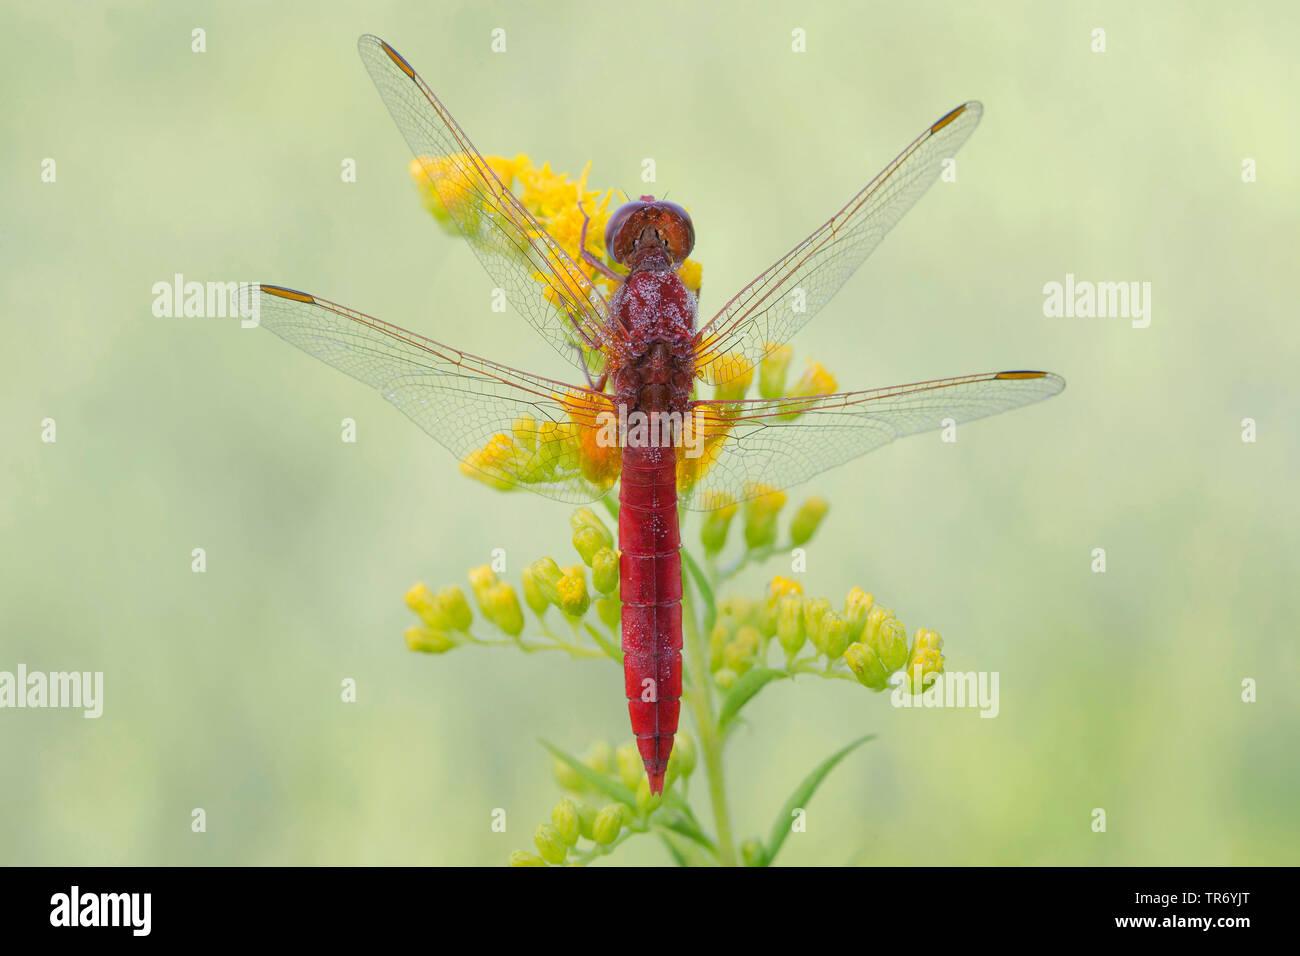 Broad Scarlet, Common Scarlet-darter, Scarlet Darter, Scarlet Dragonfly (Crocothemis erythraea, Croccothemis erythraea), male at a goldenrod, Germany, Bavaria Stock Photo